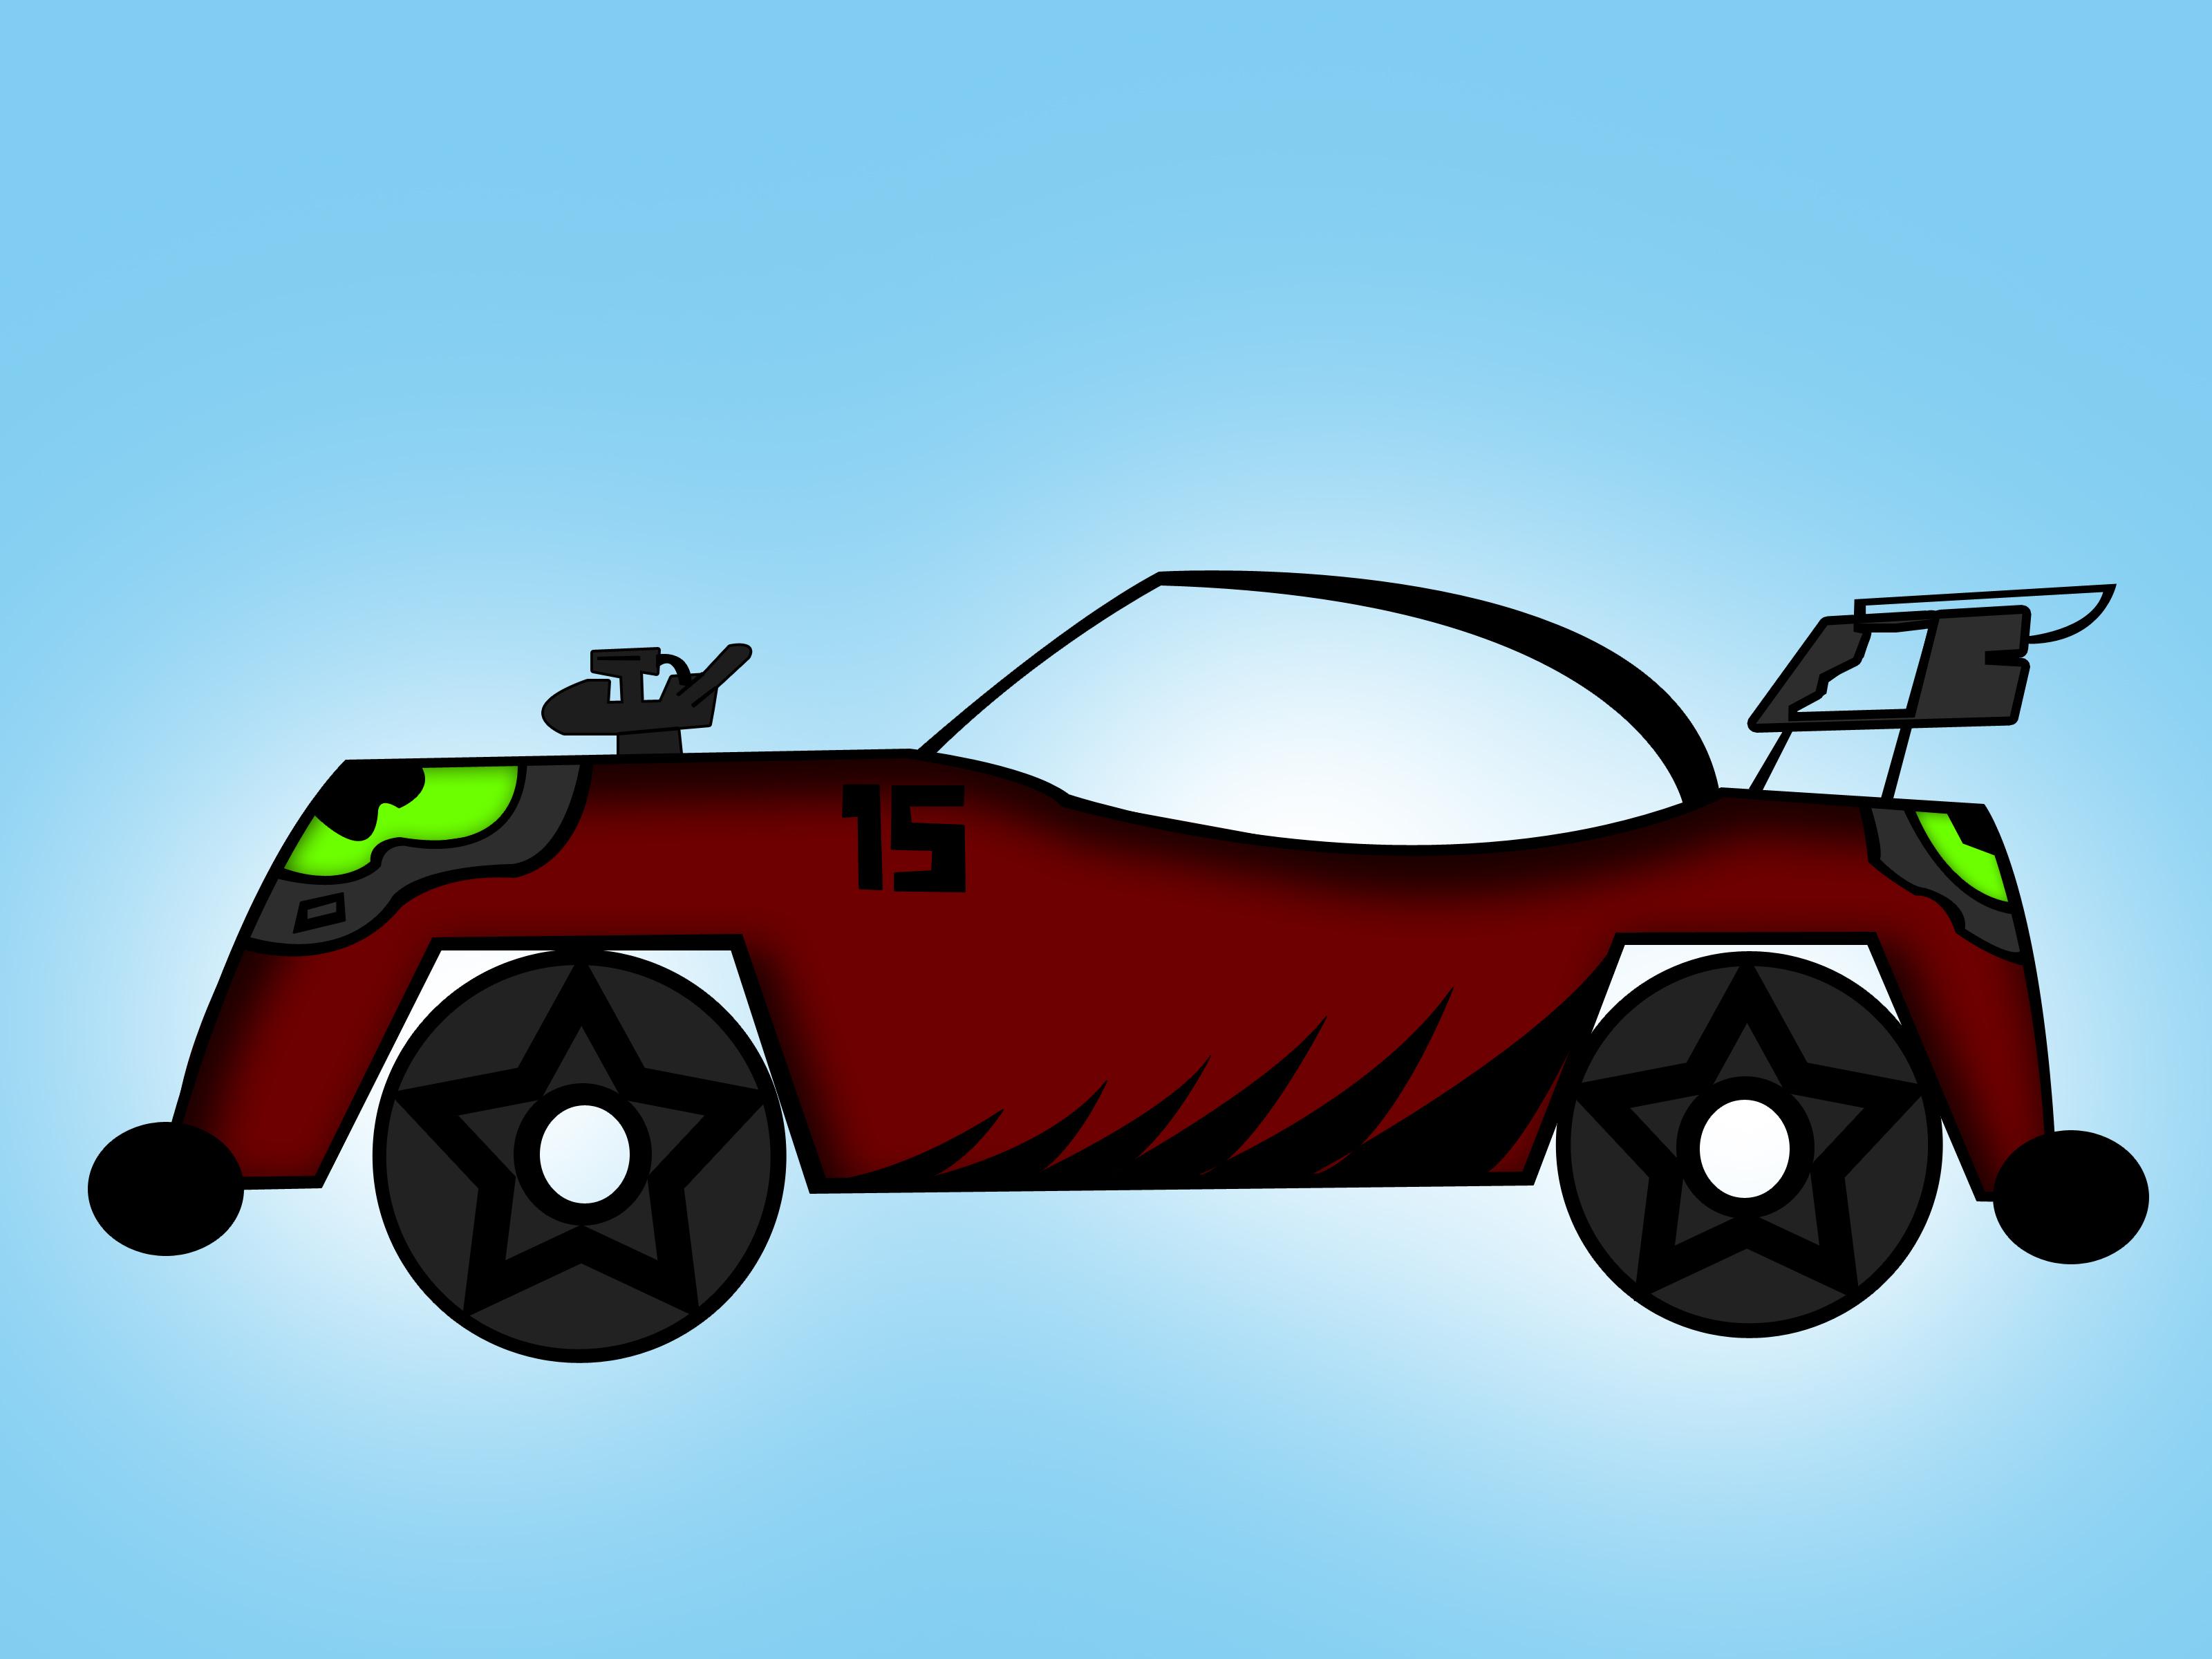 3200x2400 Drawing Vehicles